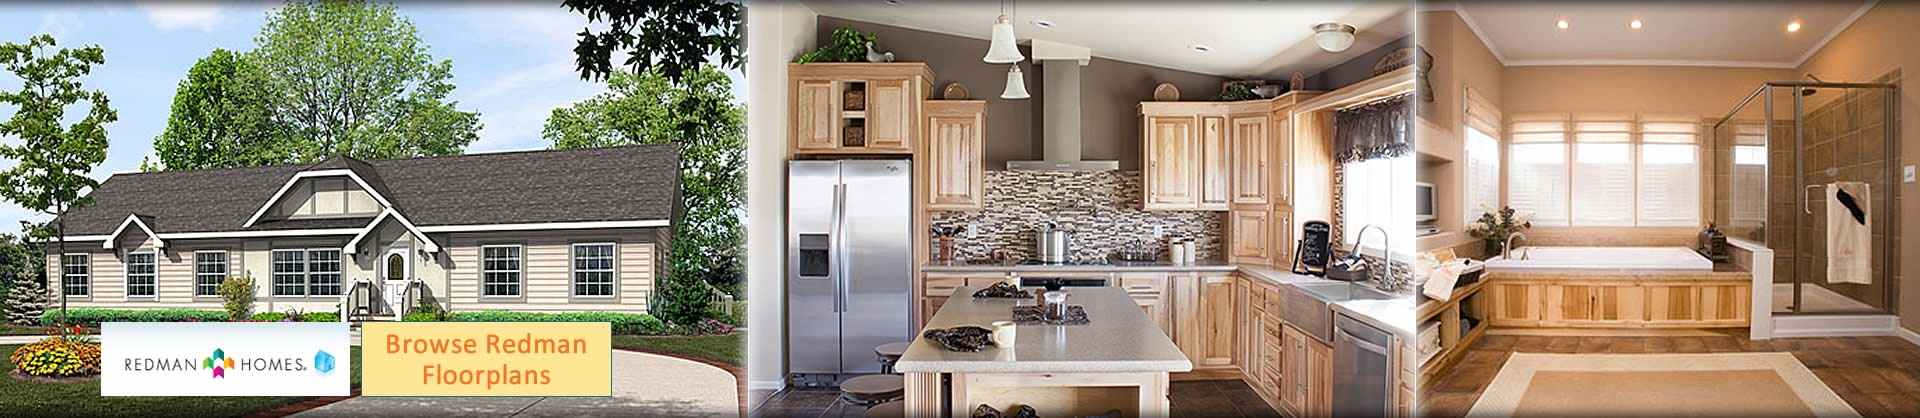 Redman Modular Homes, Wyoming